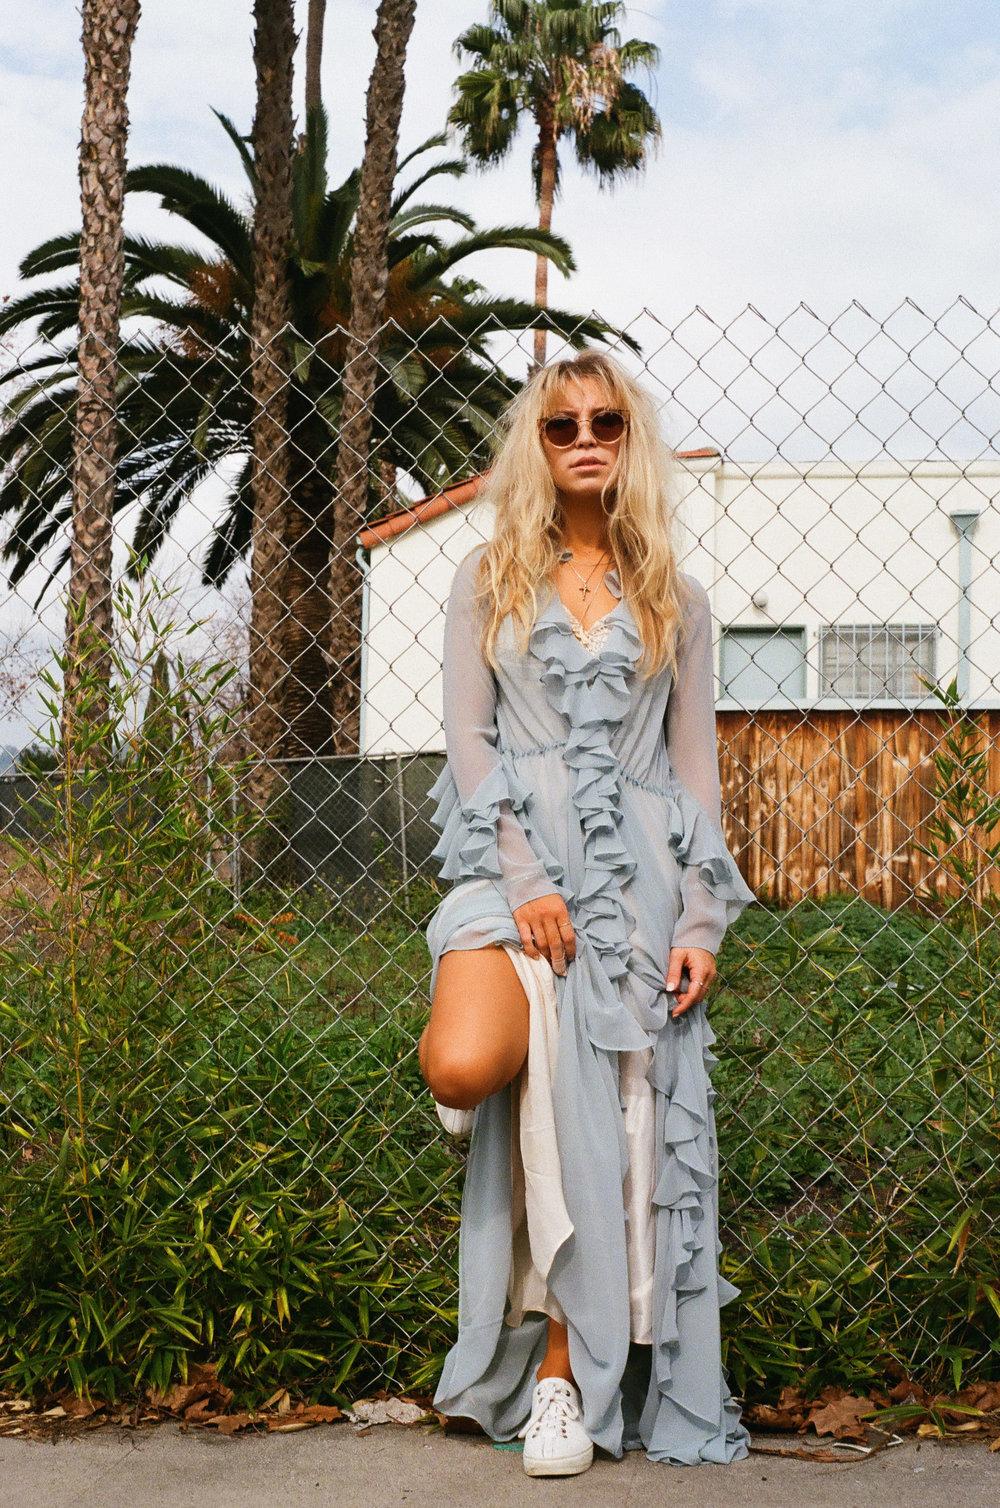 Stephanie-Severance-Kenmark-Eyewear-000300370007.jpg